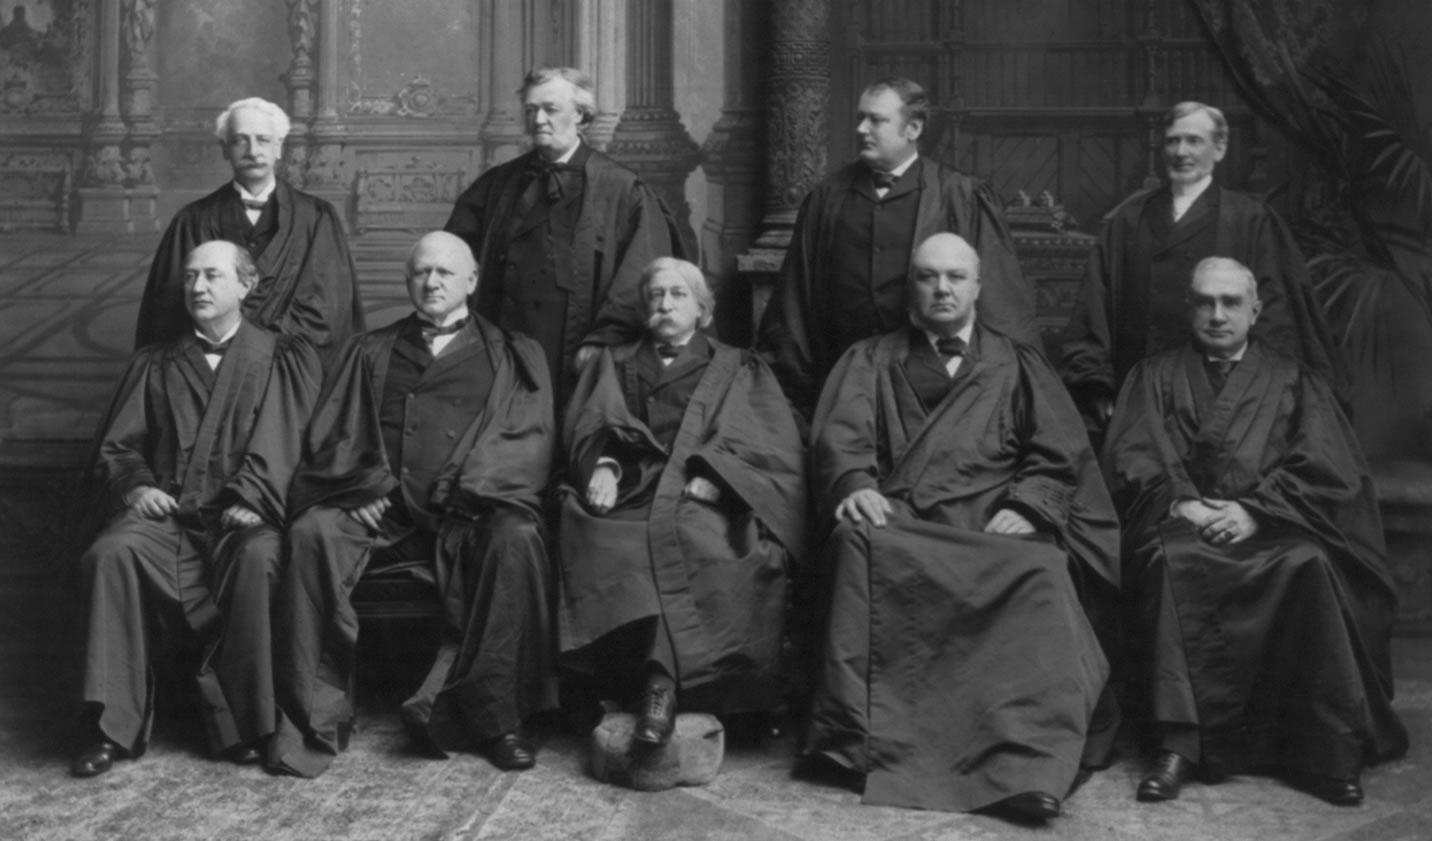 The Fuller Supreme Court, 1899